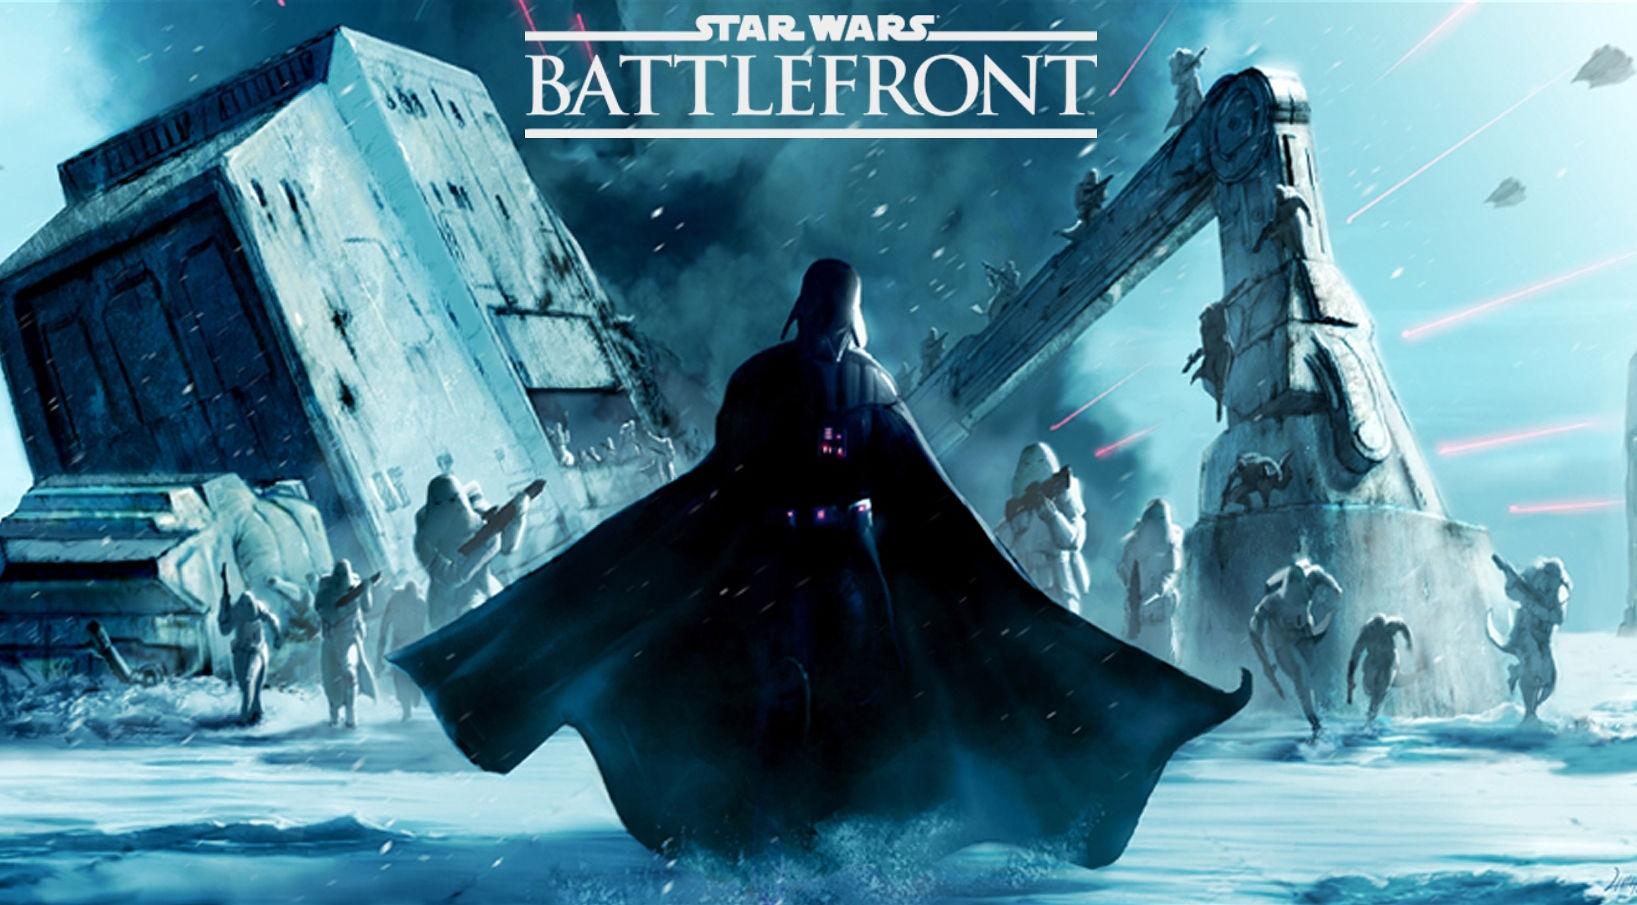 Star Wars: Battlefront | Disponibilizado trailer de lançamento